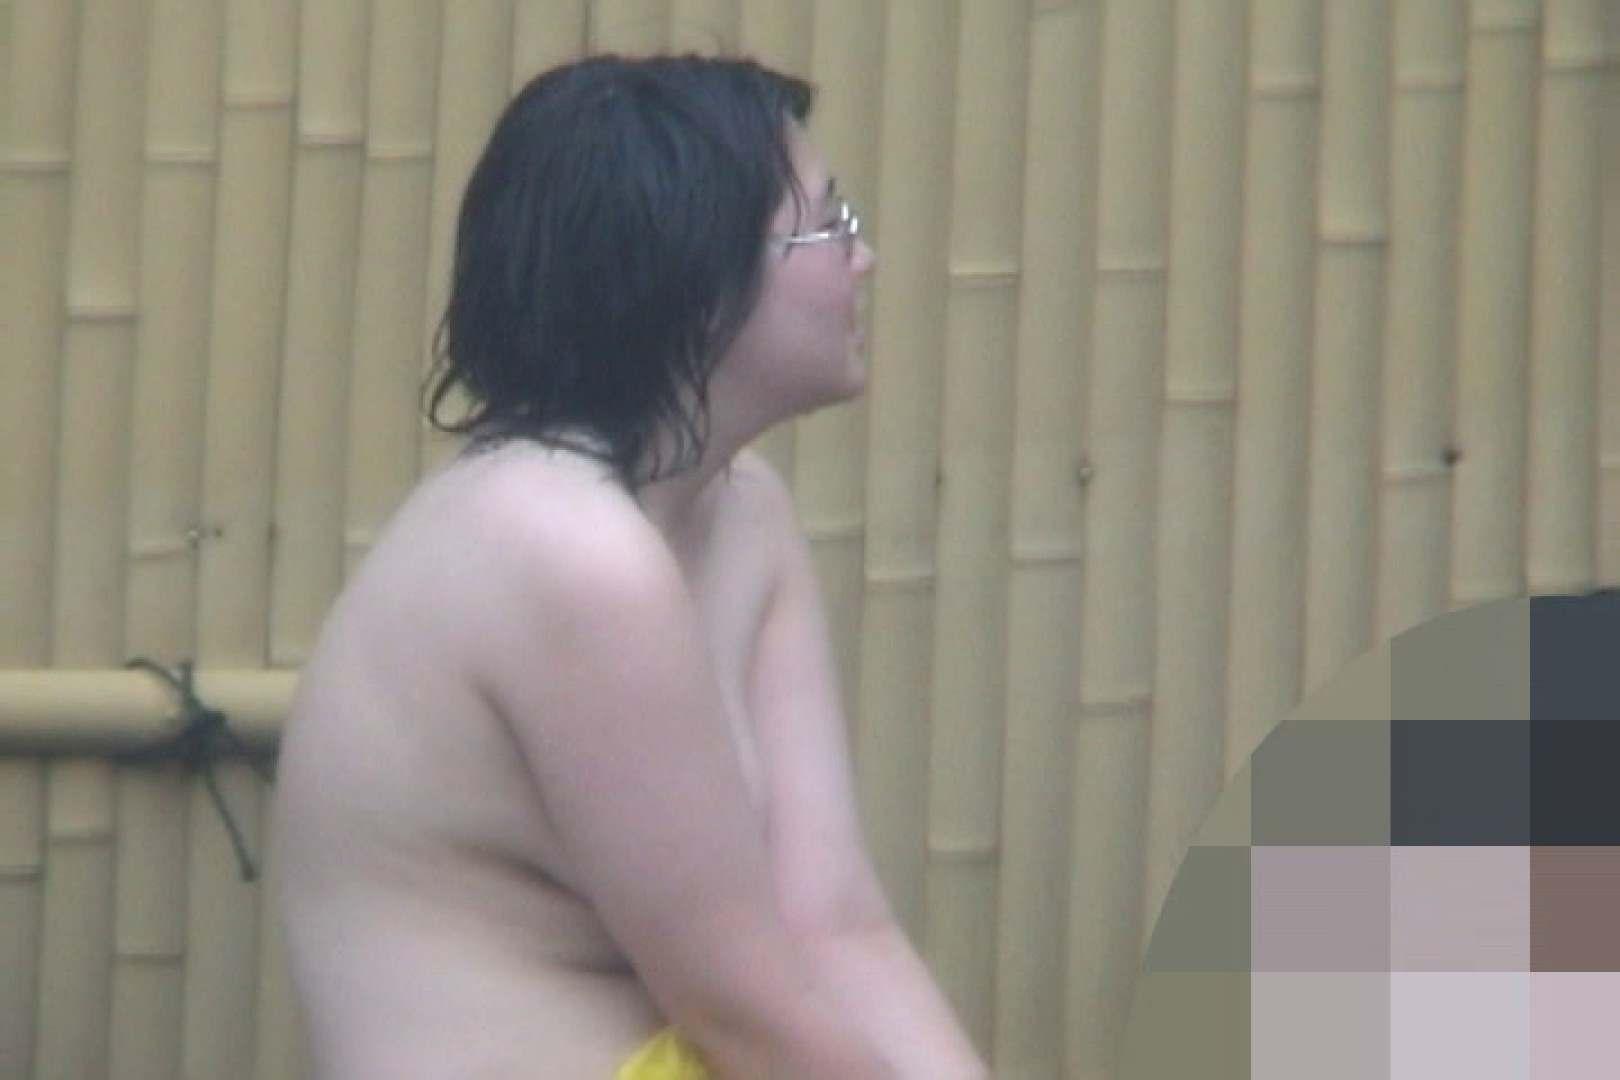 Aquaな露天風呂Vol.46【VIP限定】 露天風呂突入 | 盗撮師作品  76pic 22